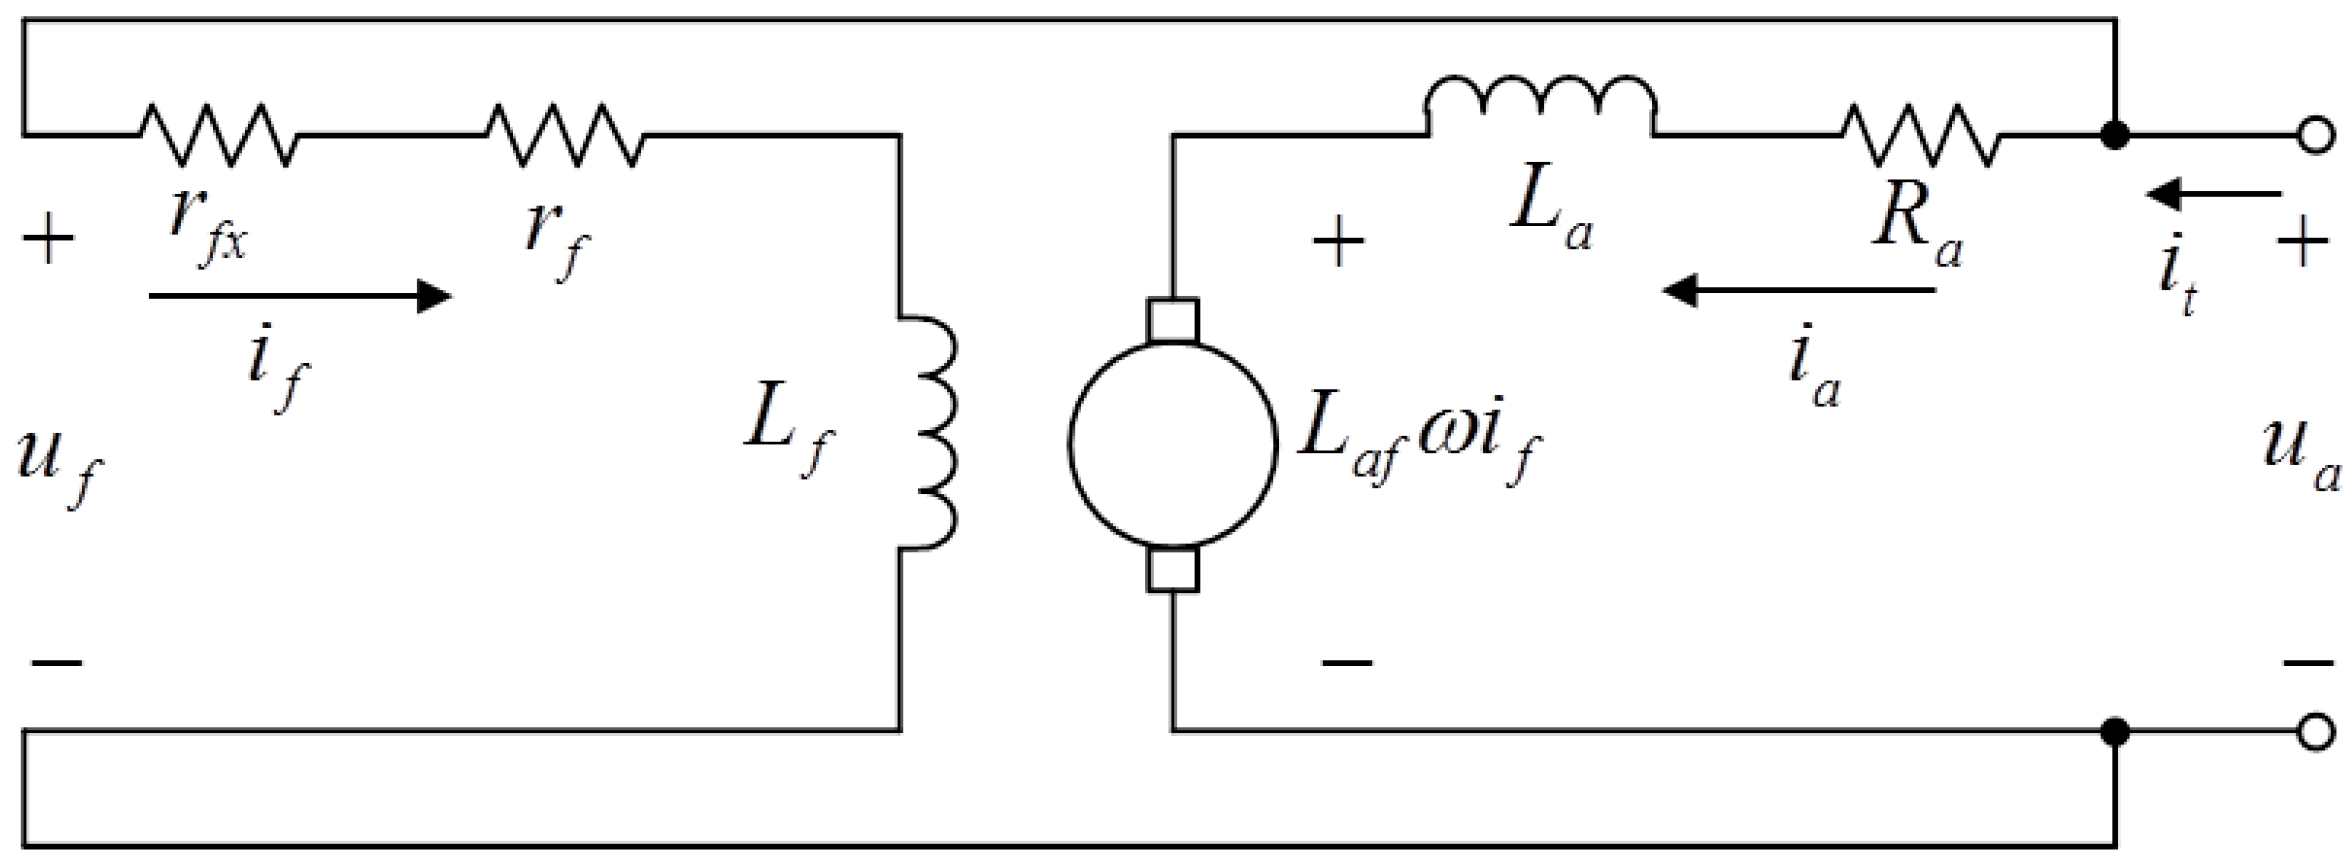 shunt motor wiring diagram 1995 honda civic ac brushed dc servo control electronics